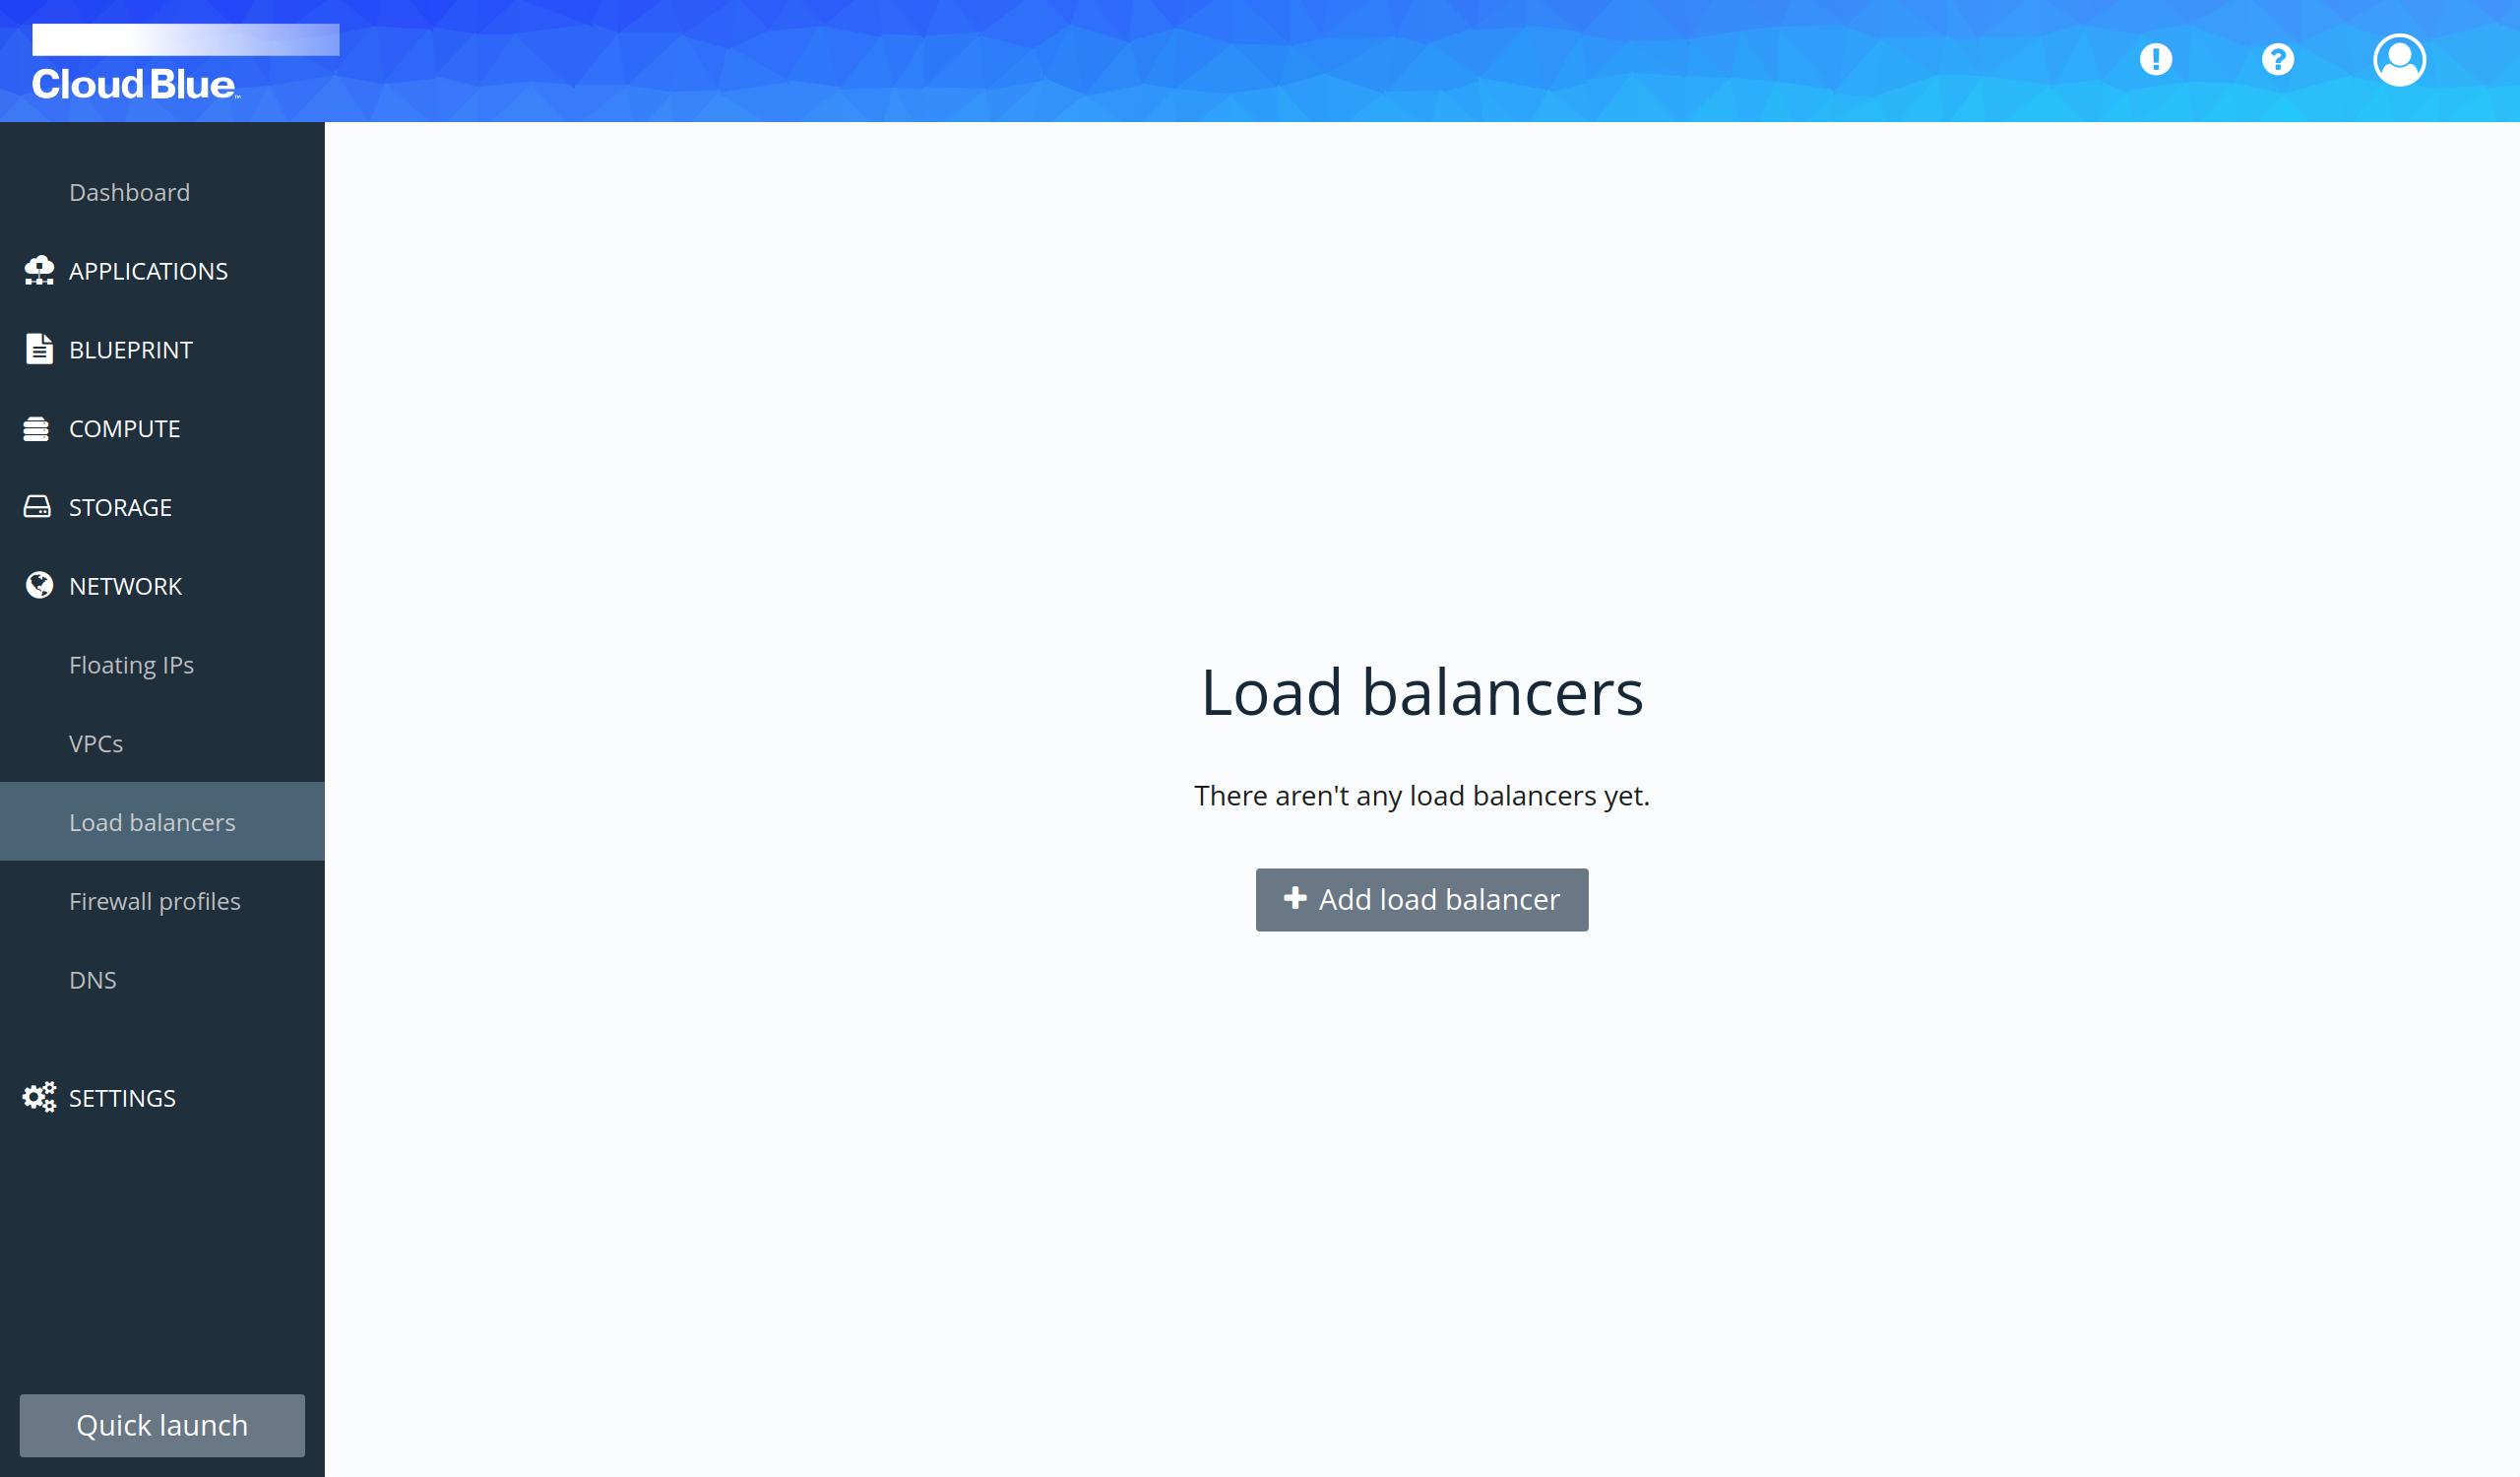 Load balancers section